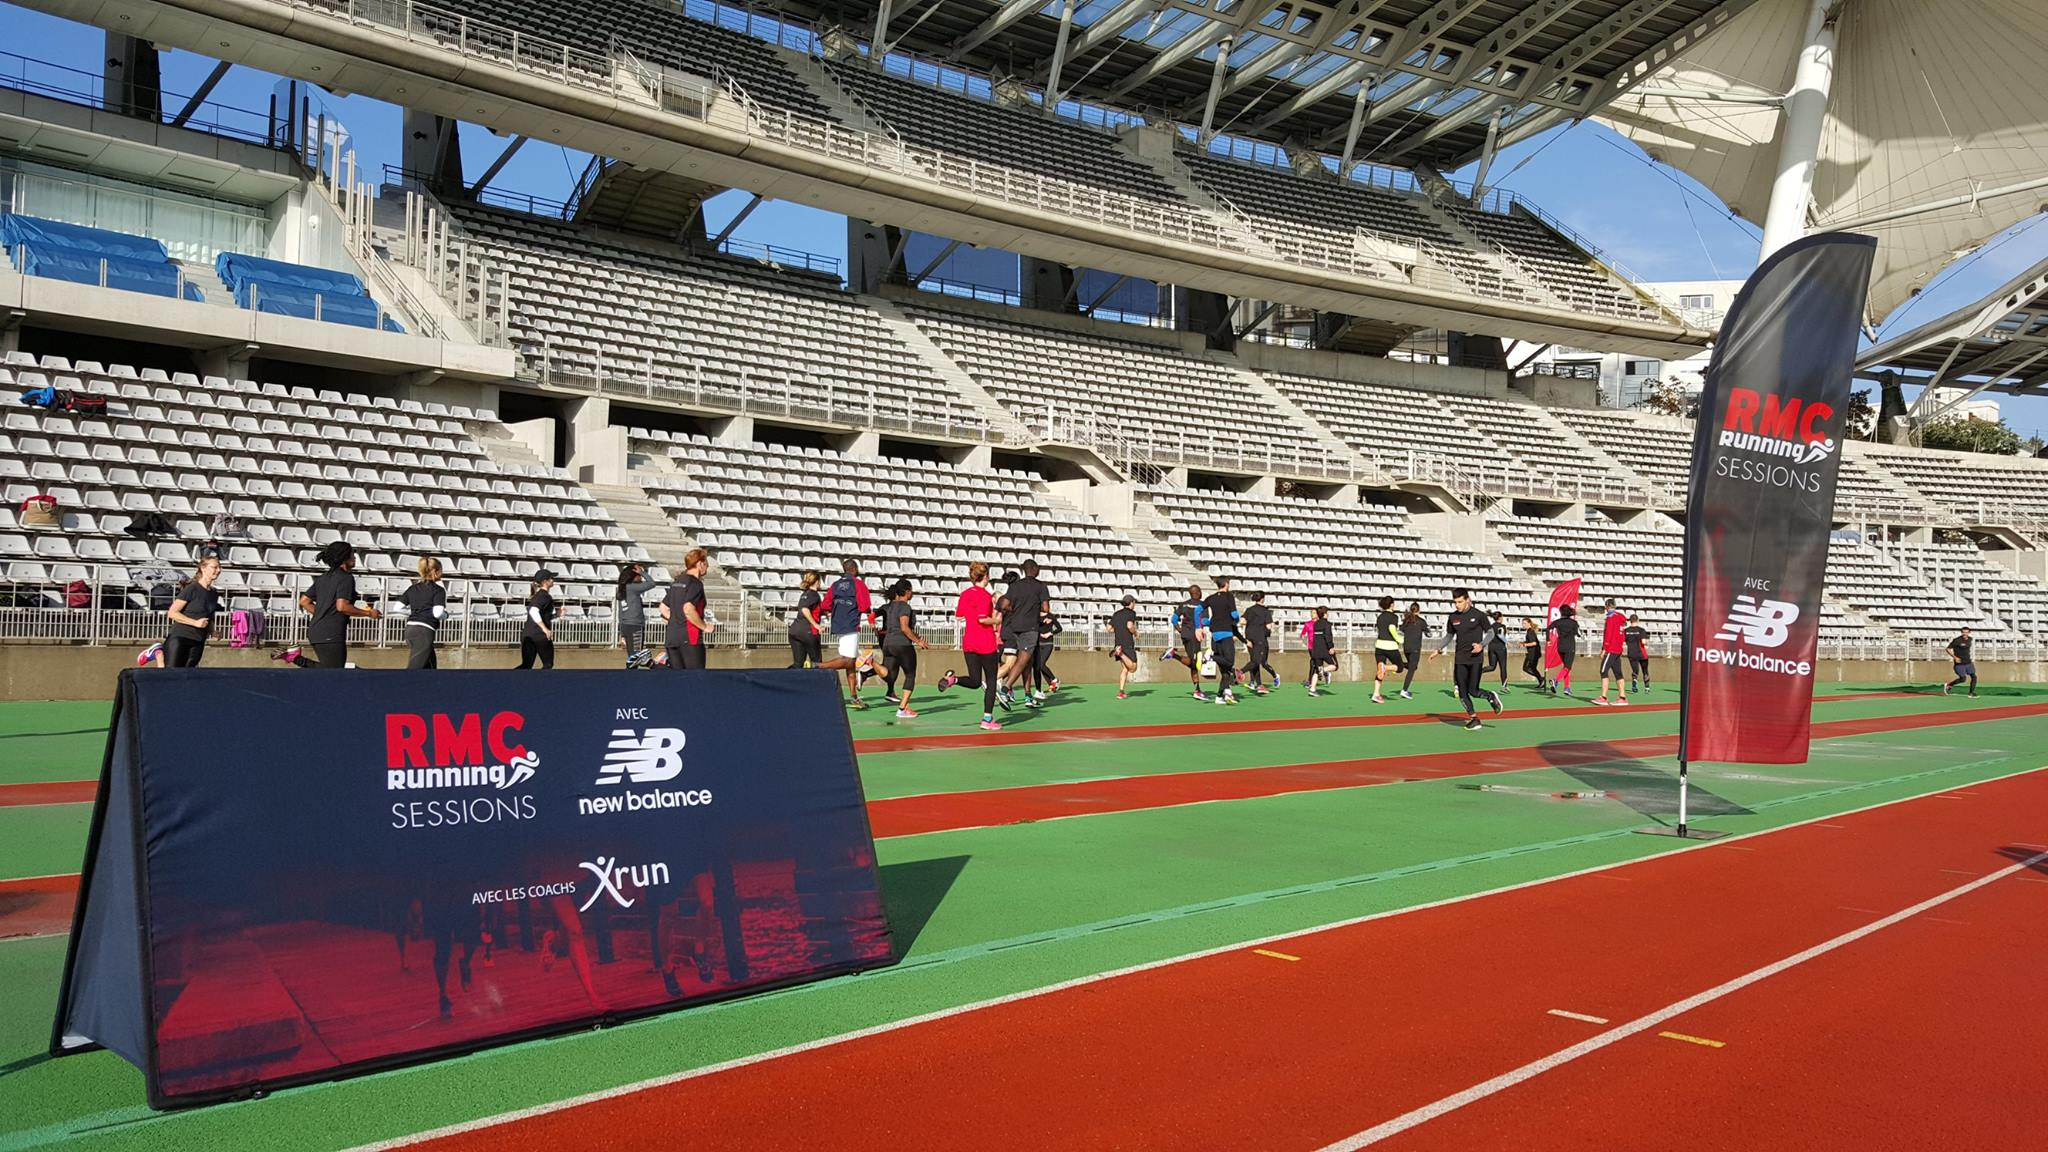 RMC Running Session au Stade Charléty